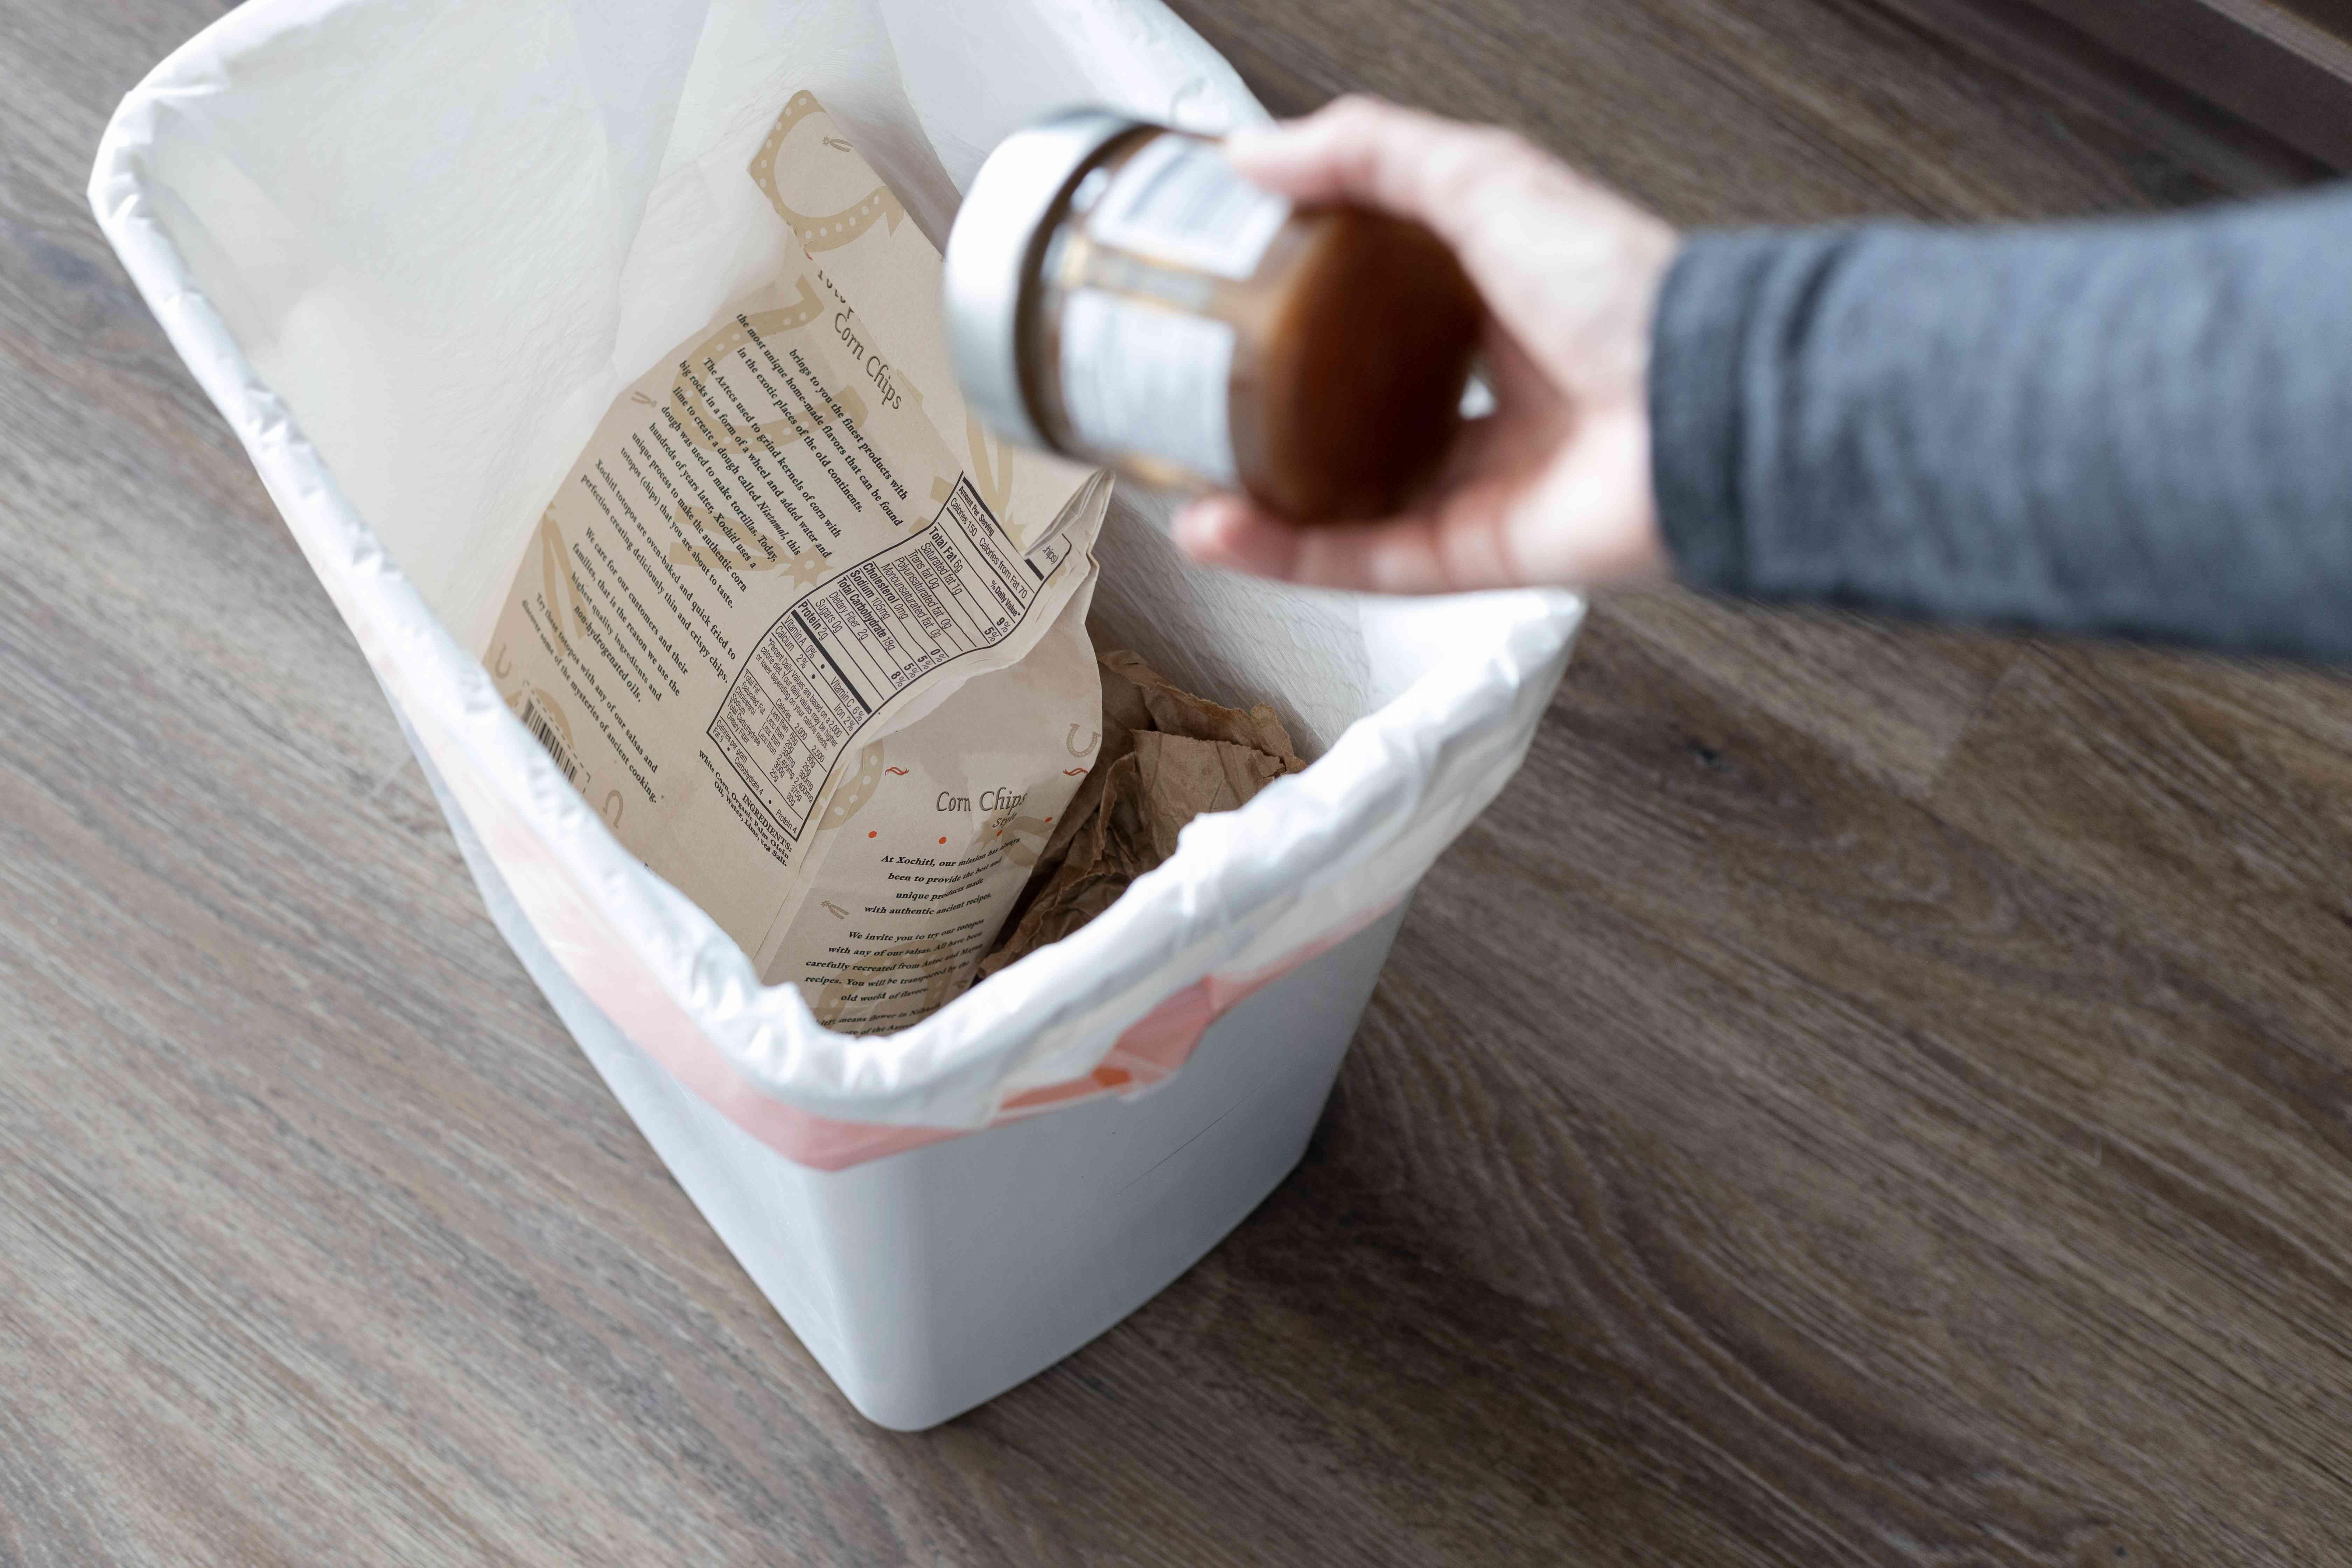 Kitchen items thrown into garbage bin by hand